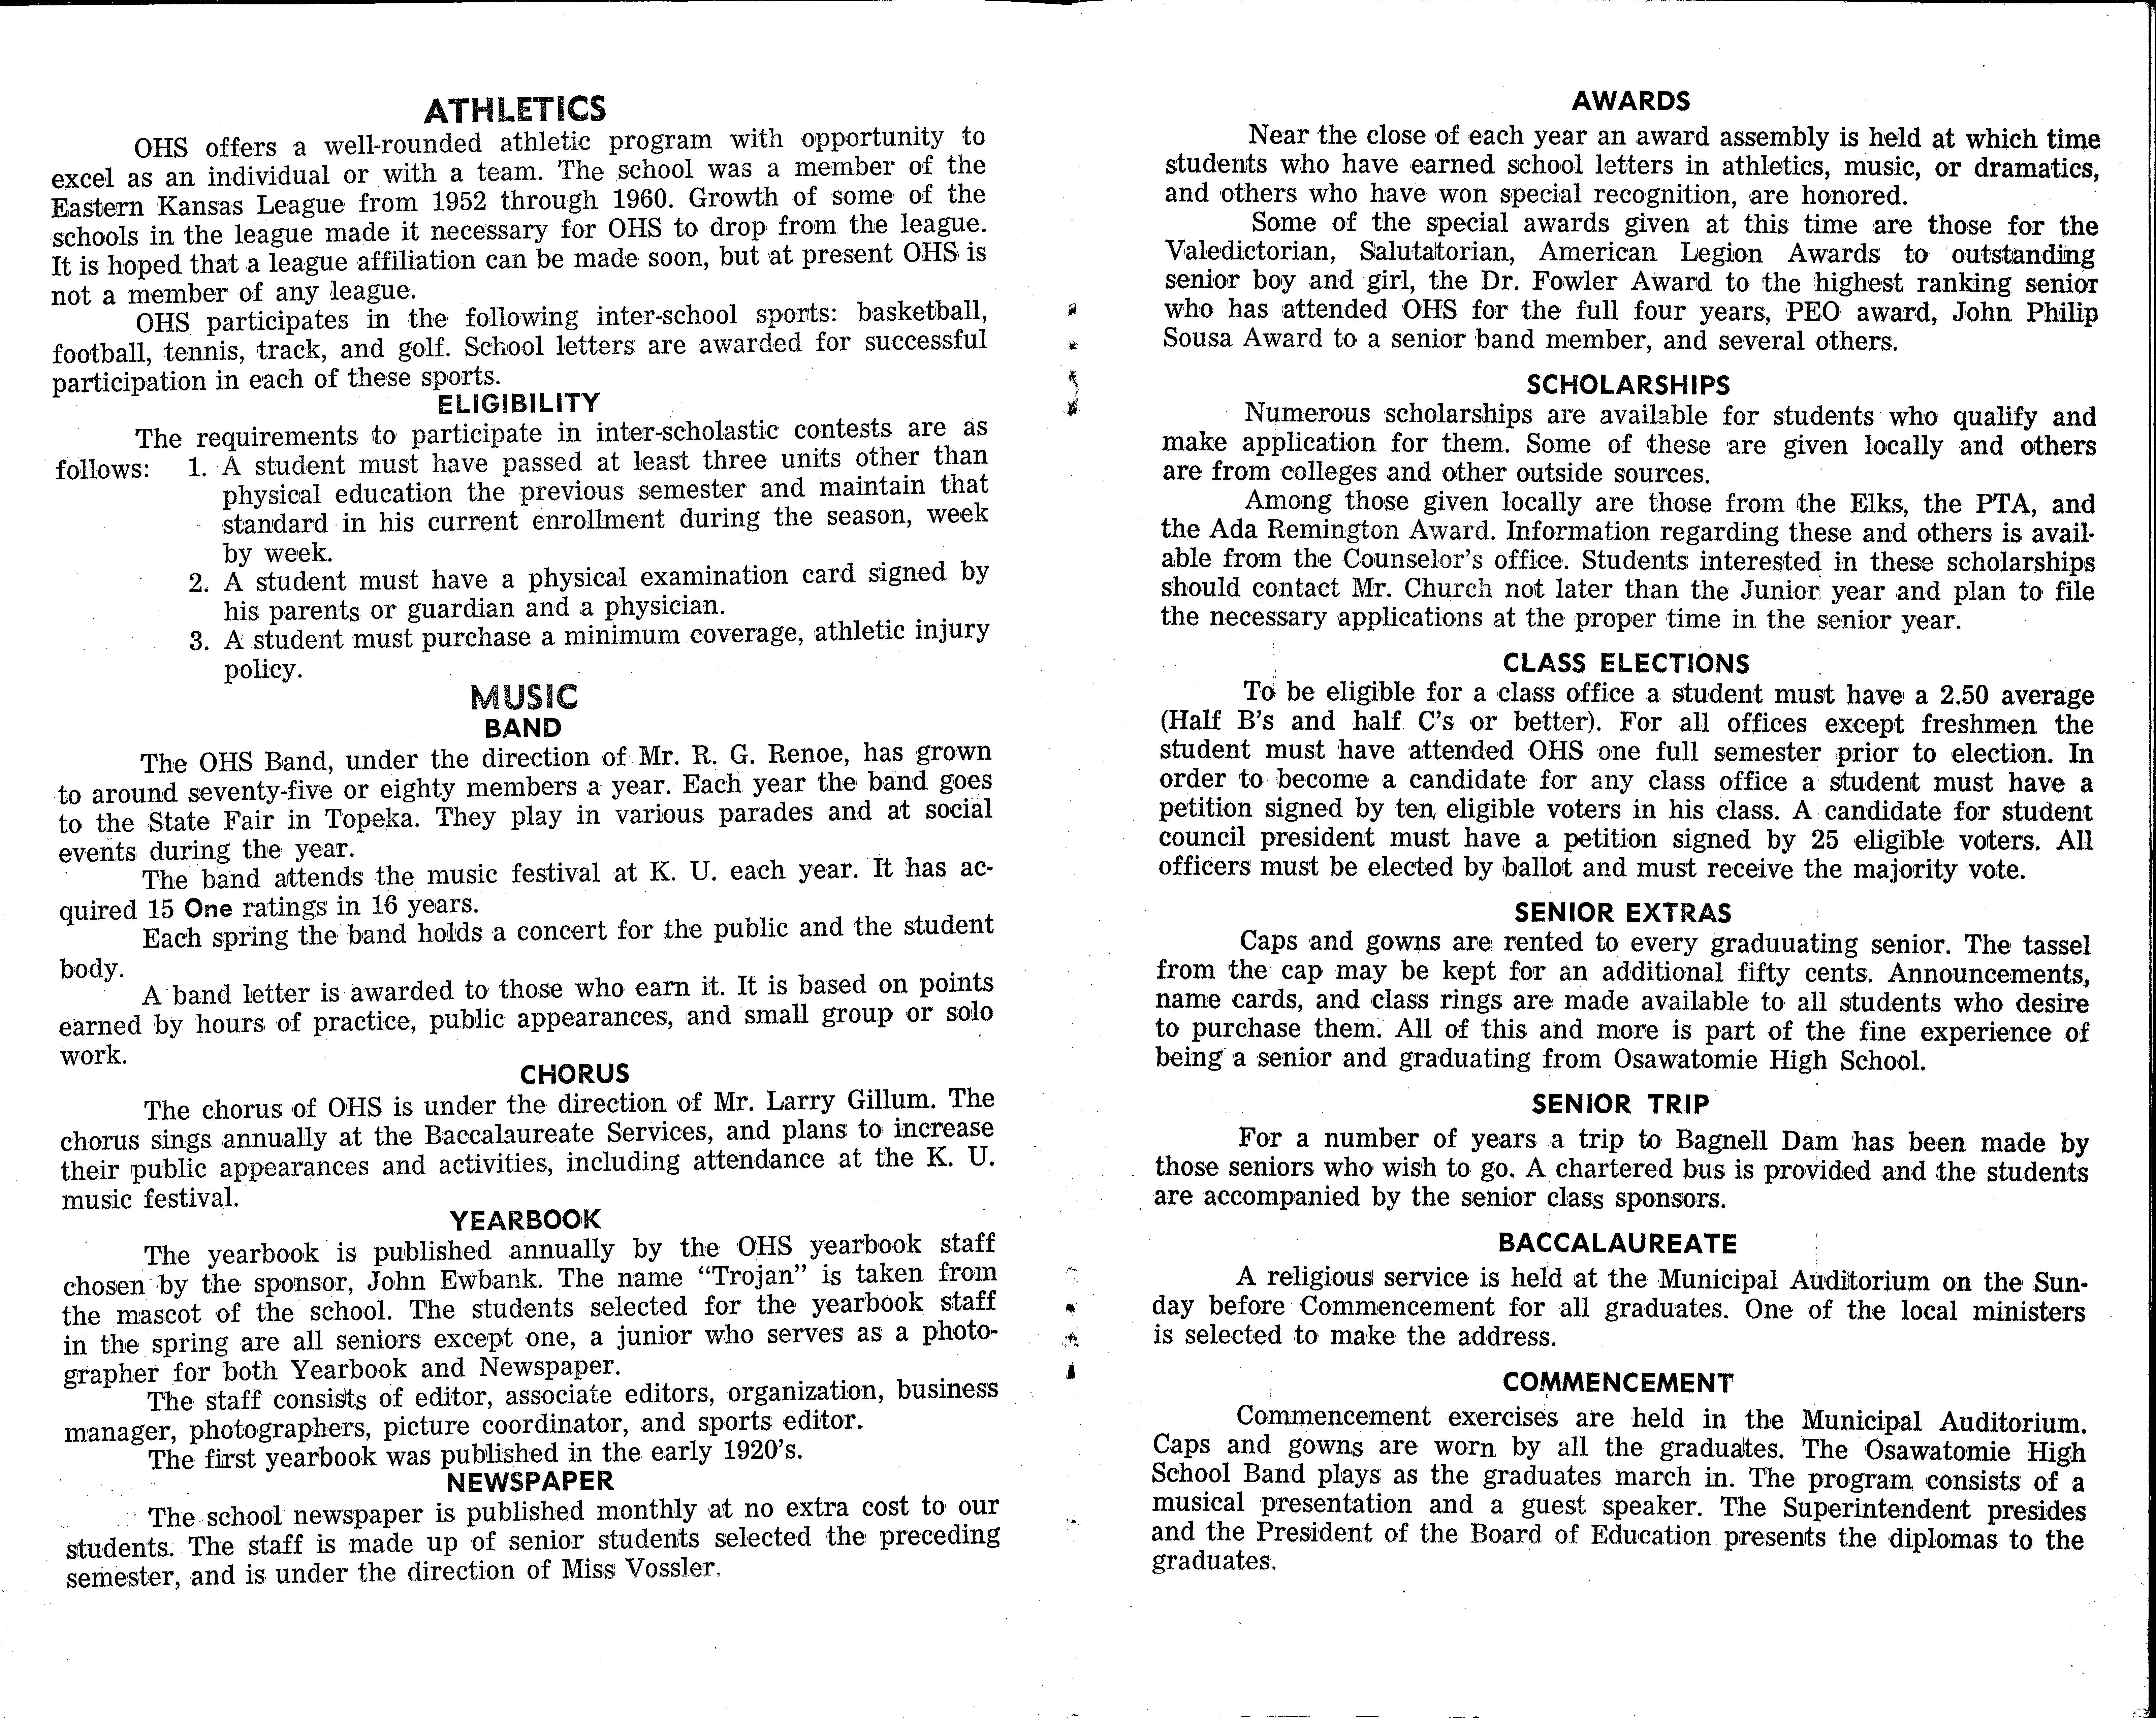 Student Handbook p6-7